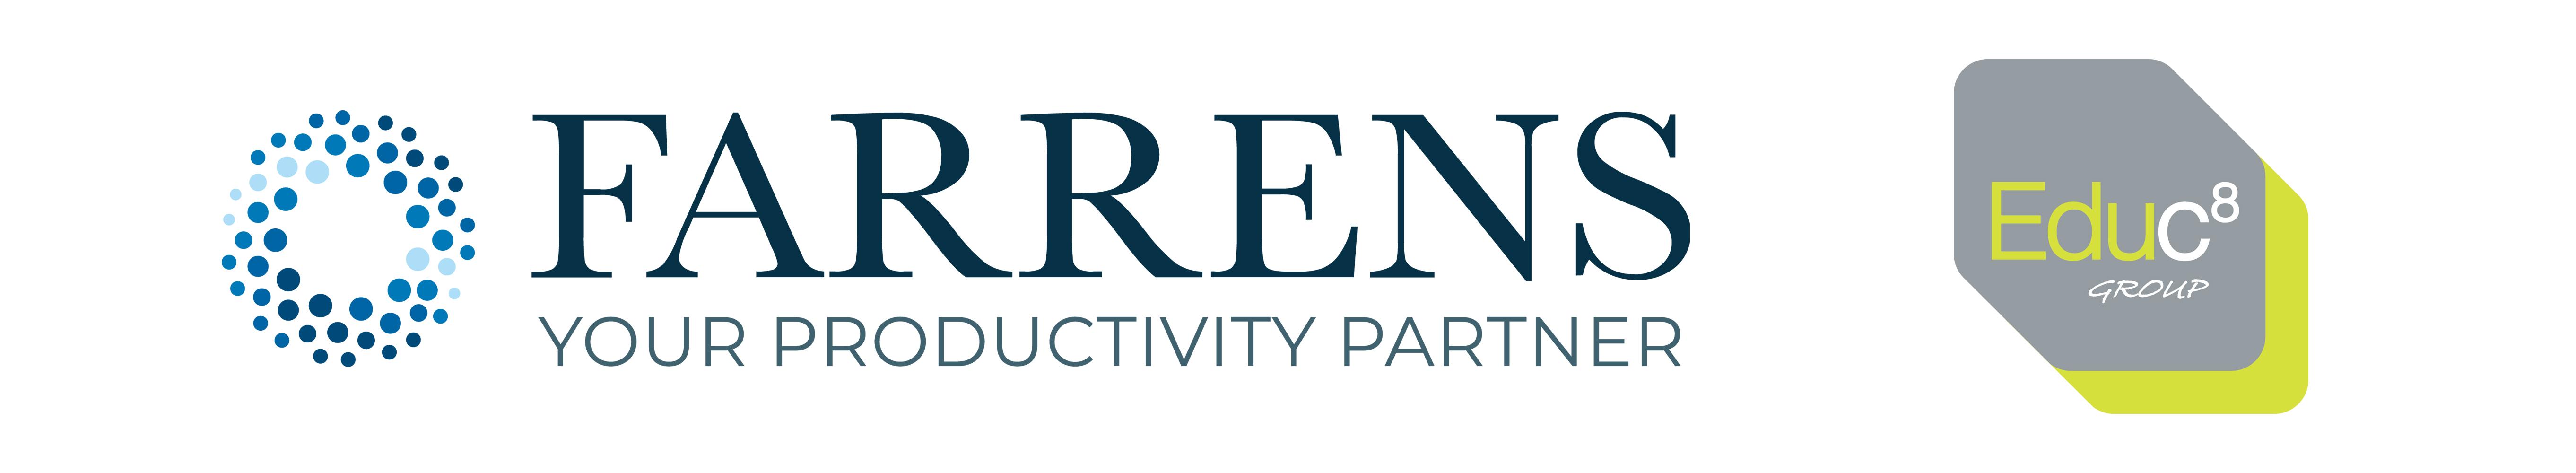 Farrens and Educ8 company logos